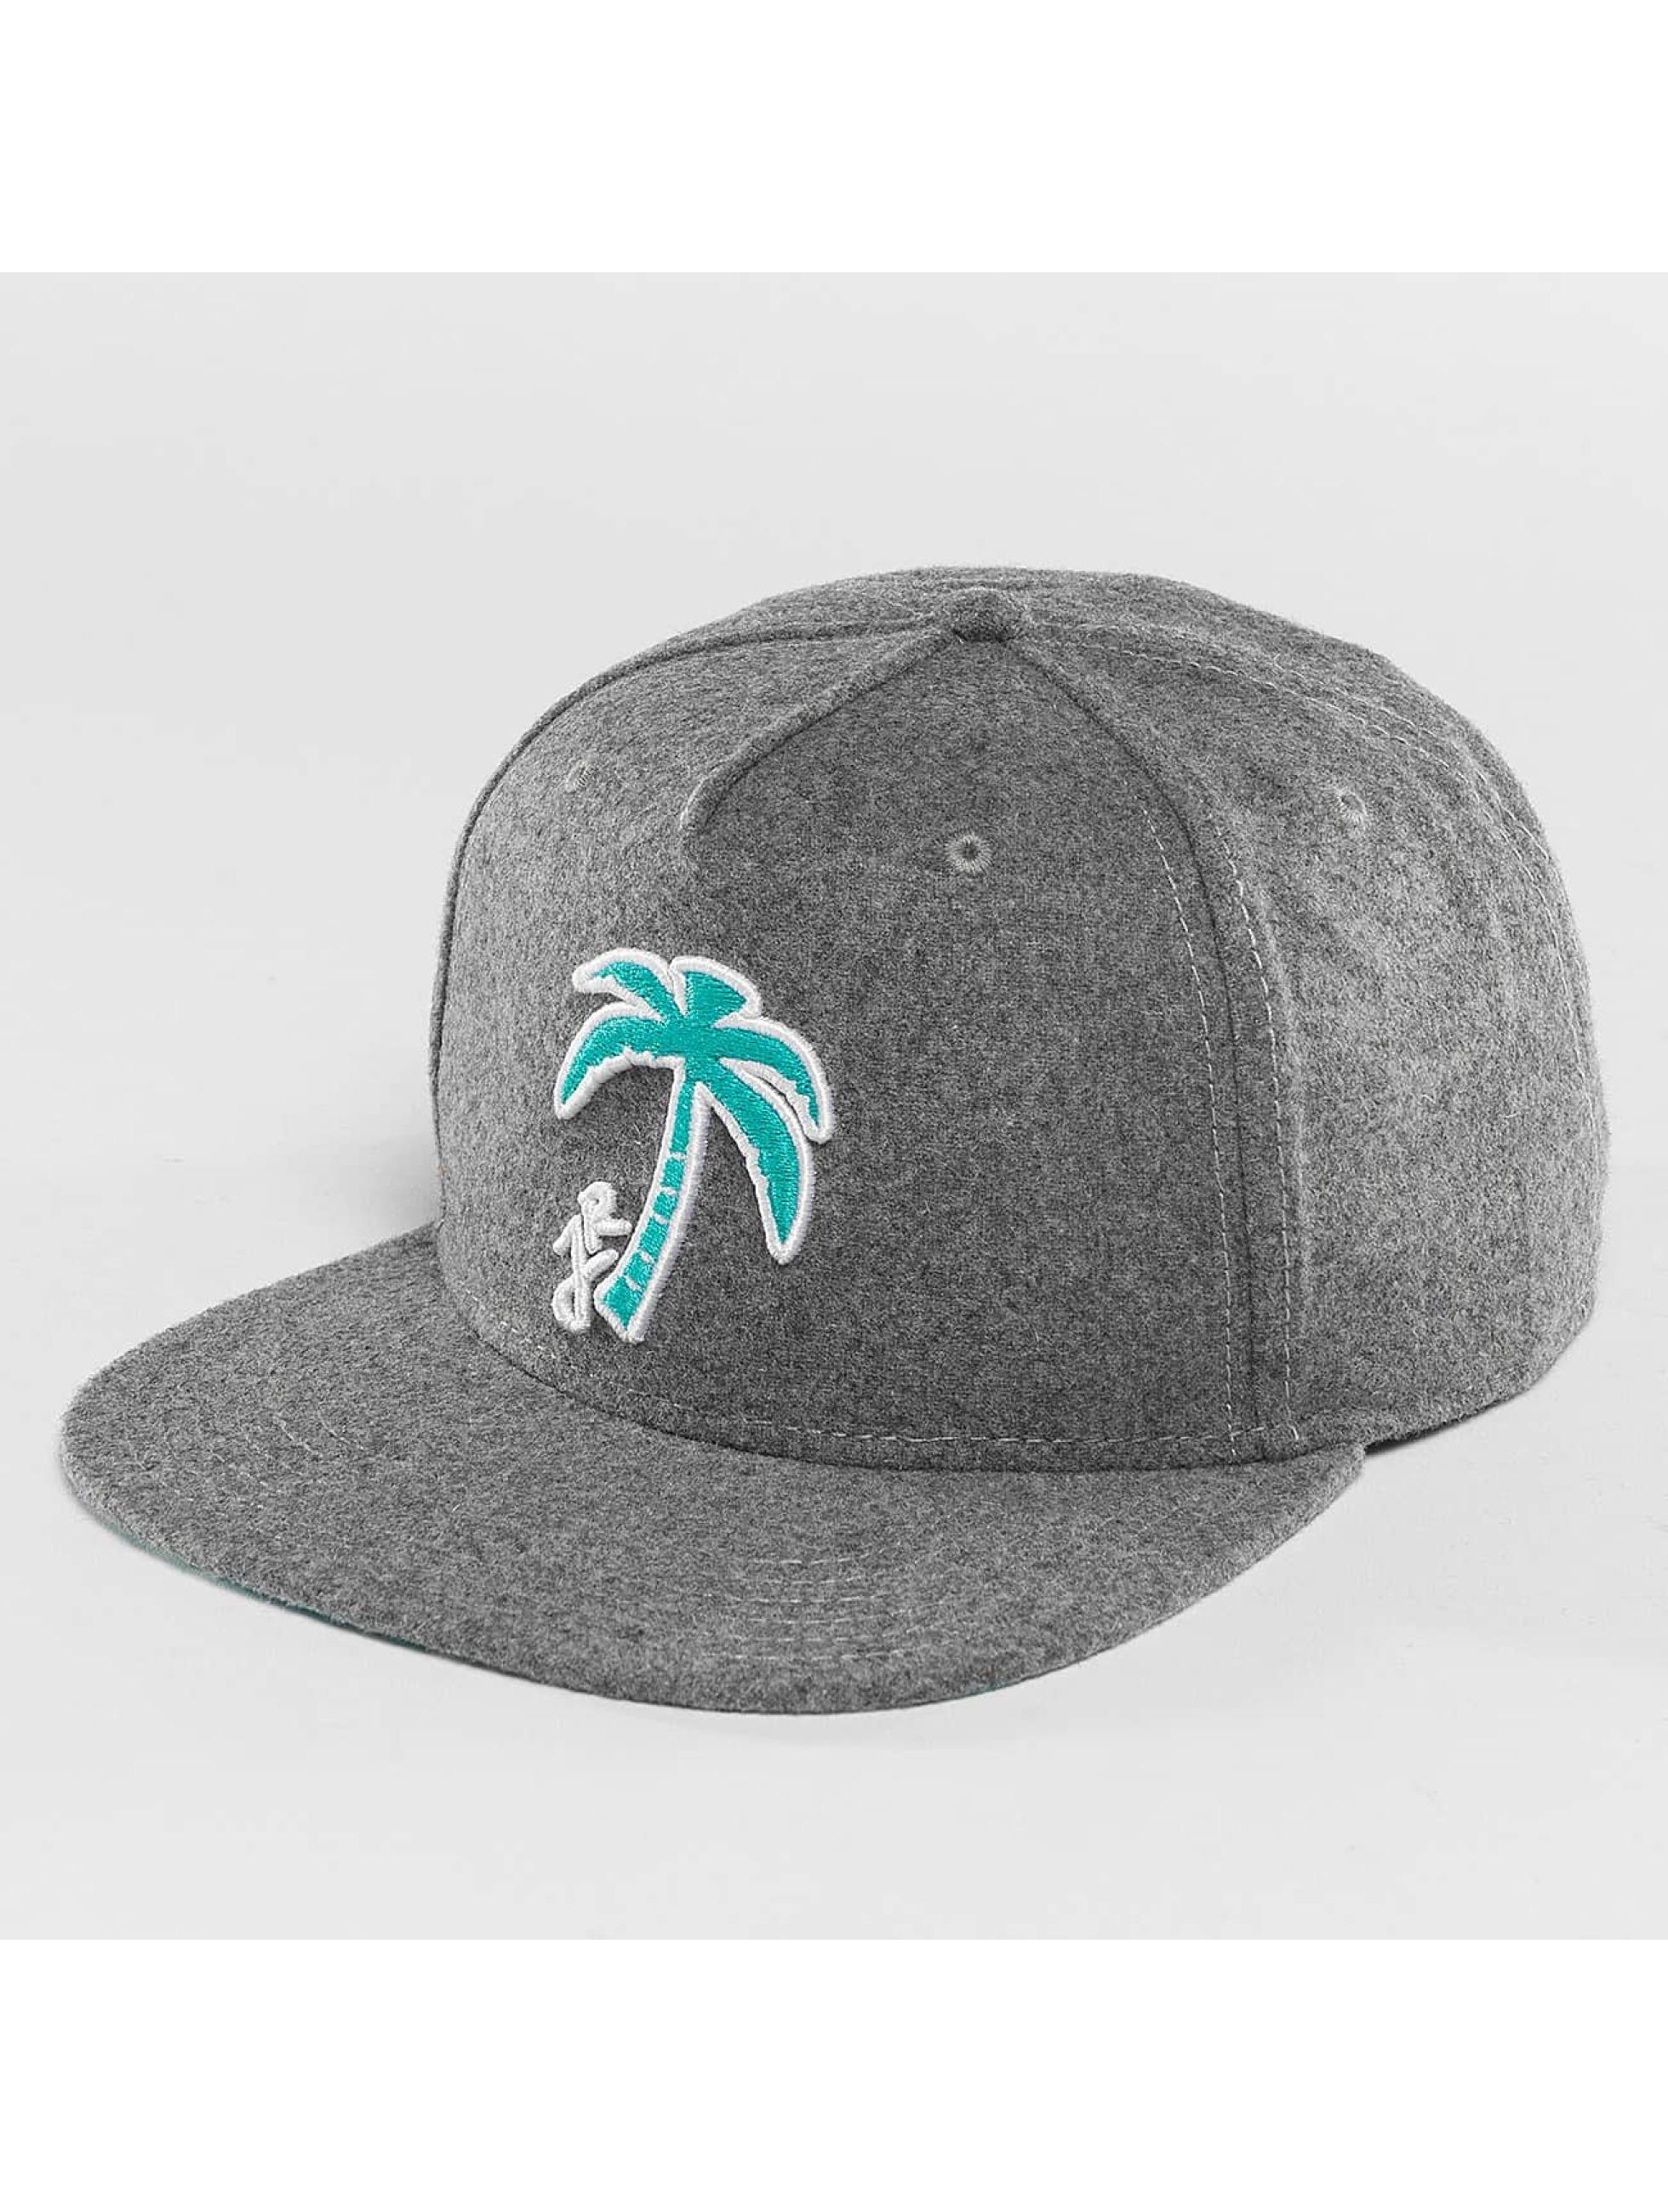 Just Rhyse / Snapback Cap Palm Desert in grey Adjustable